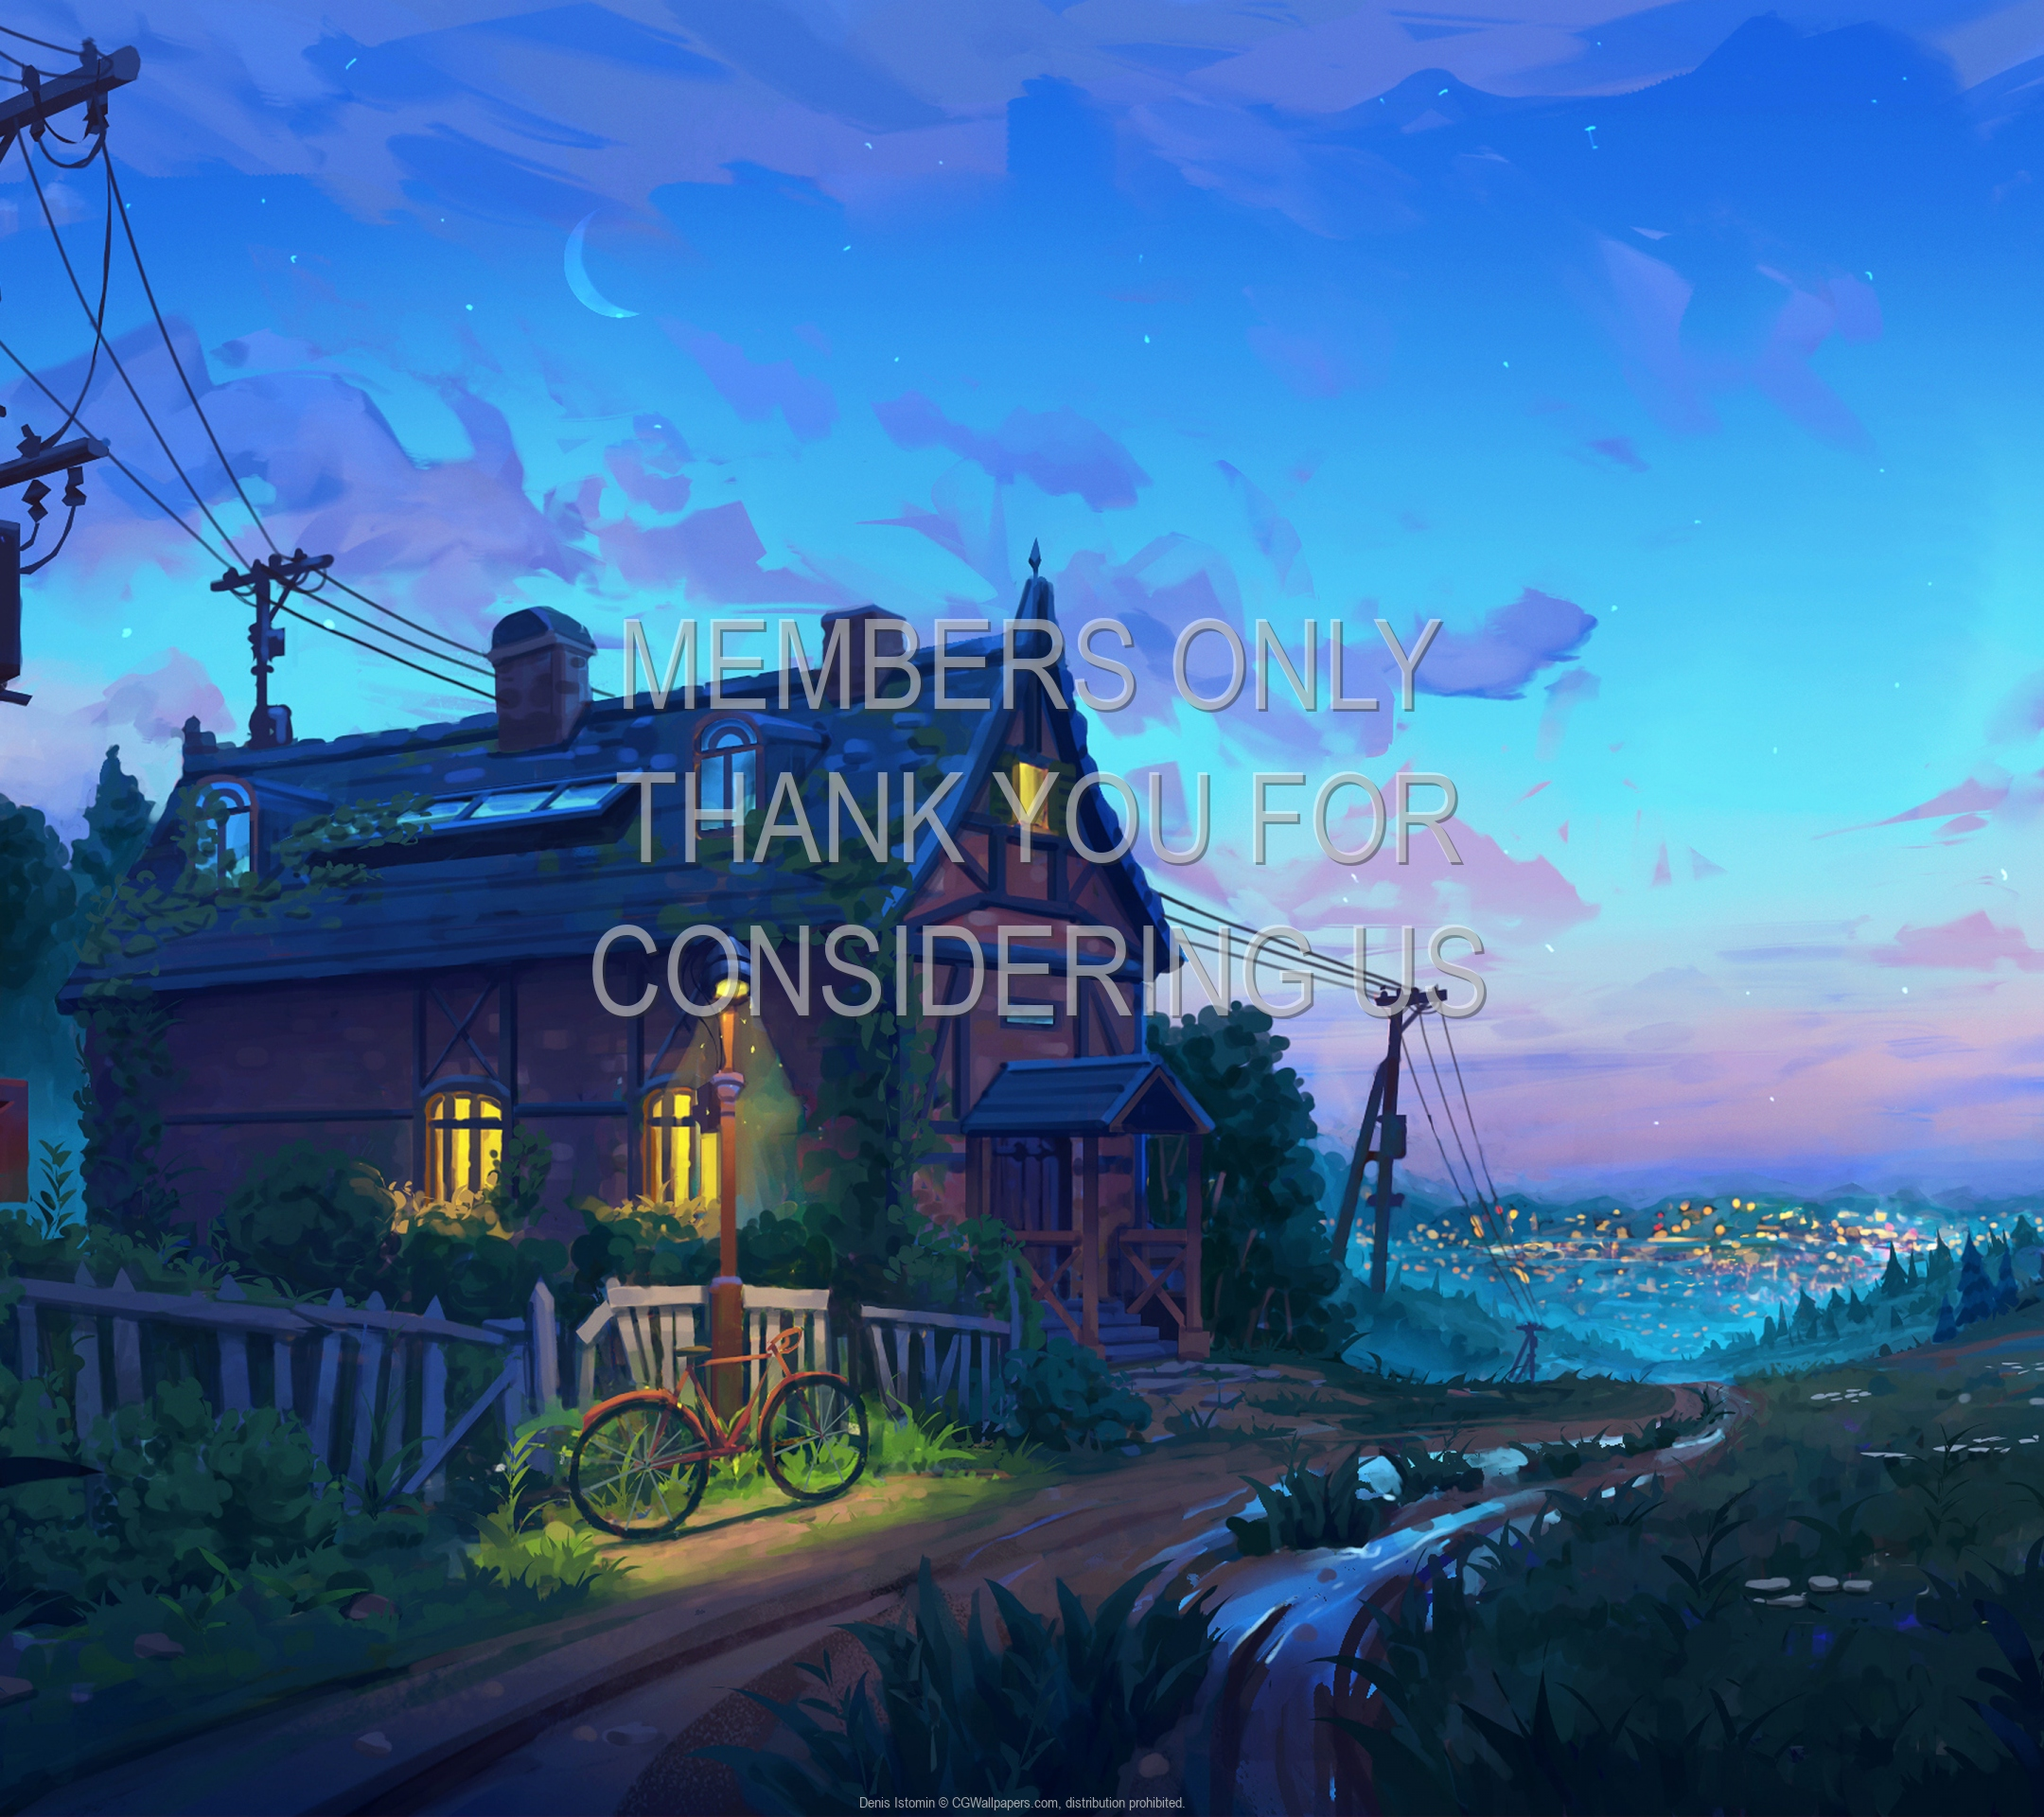 Denis Istomin 1080p Horizontal Mobile wallpaper or background 01